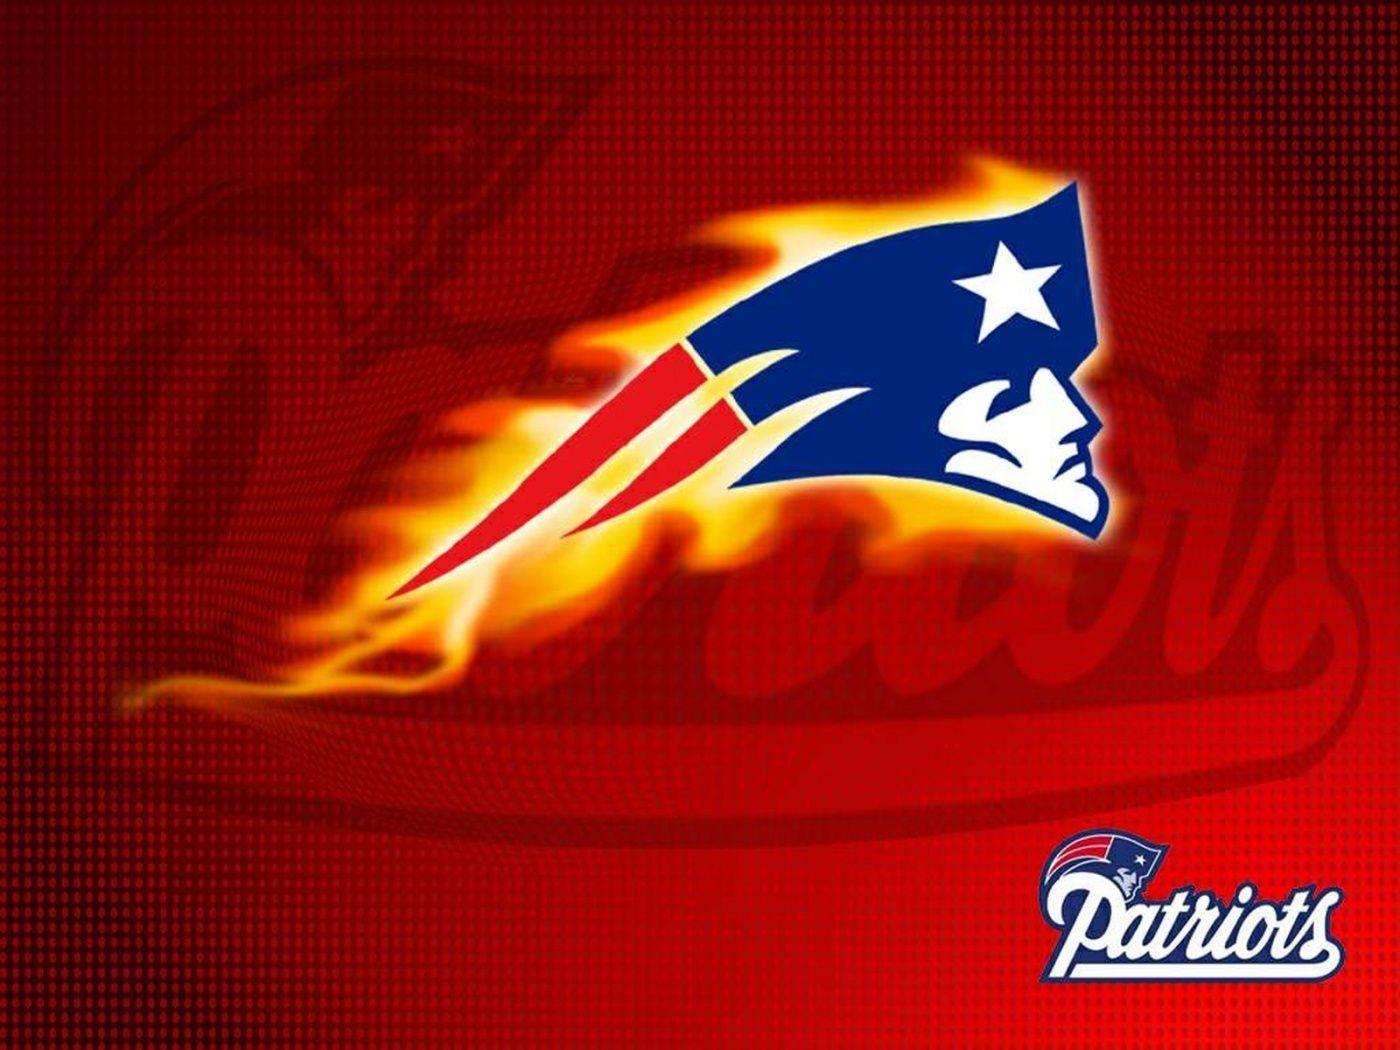 New England Patriots New England Patriots Wallpapers In 1400x1050 Resolution Patriots Logo New England Patriots Logo New England Patriots